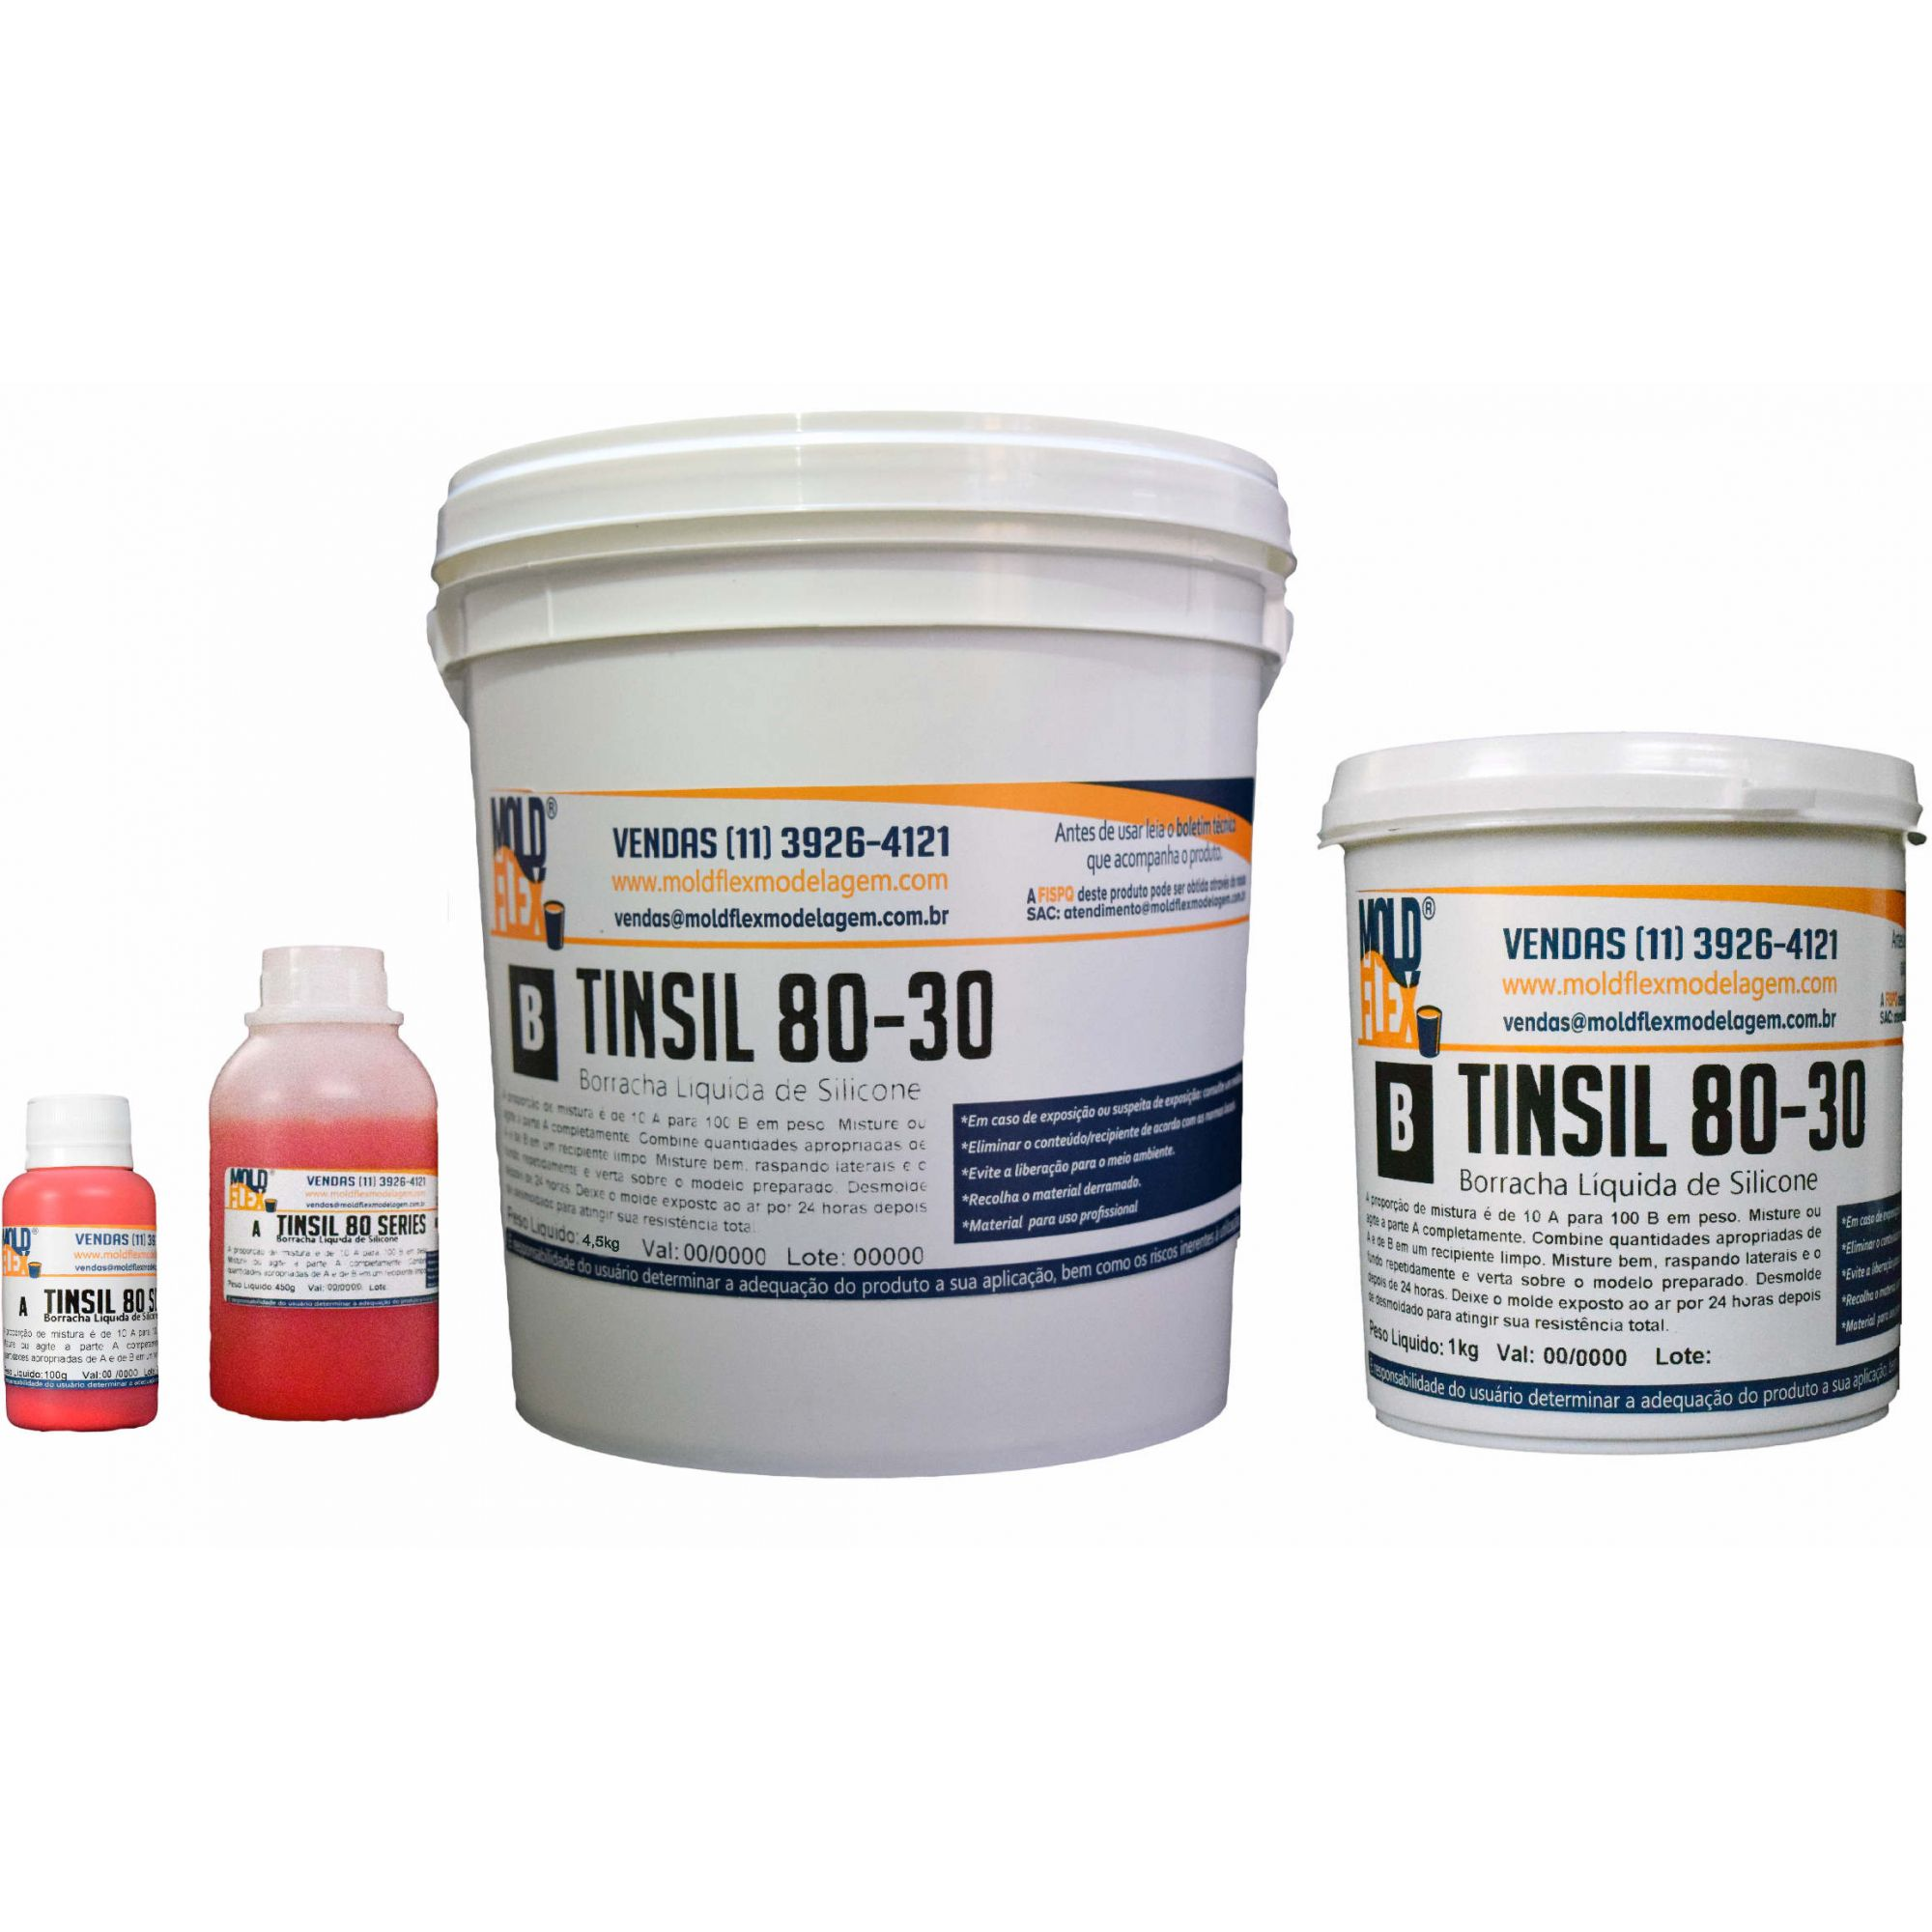 TinSil 80-30 - Borracha de Silicone Ultra-resistente